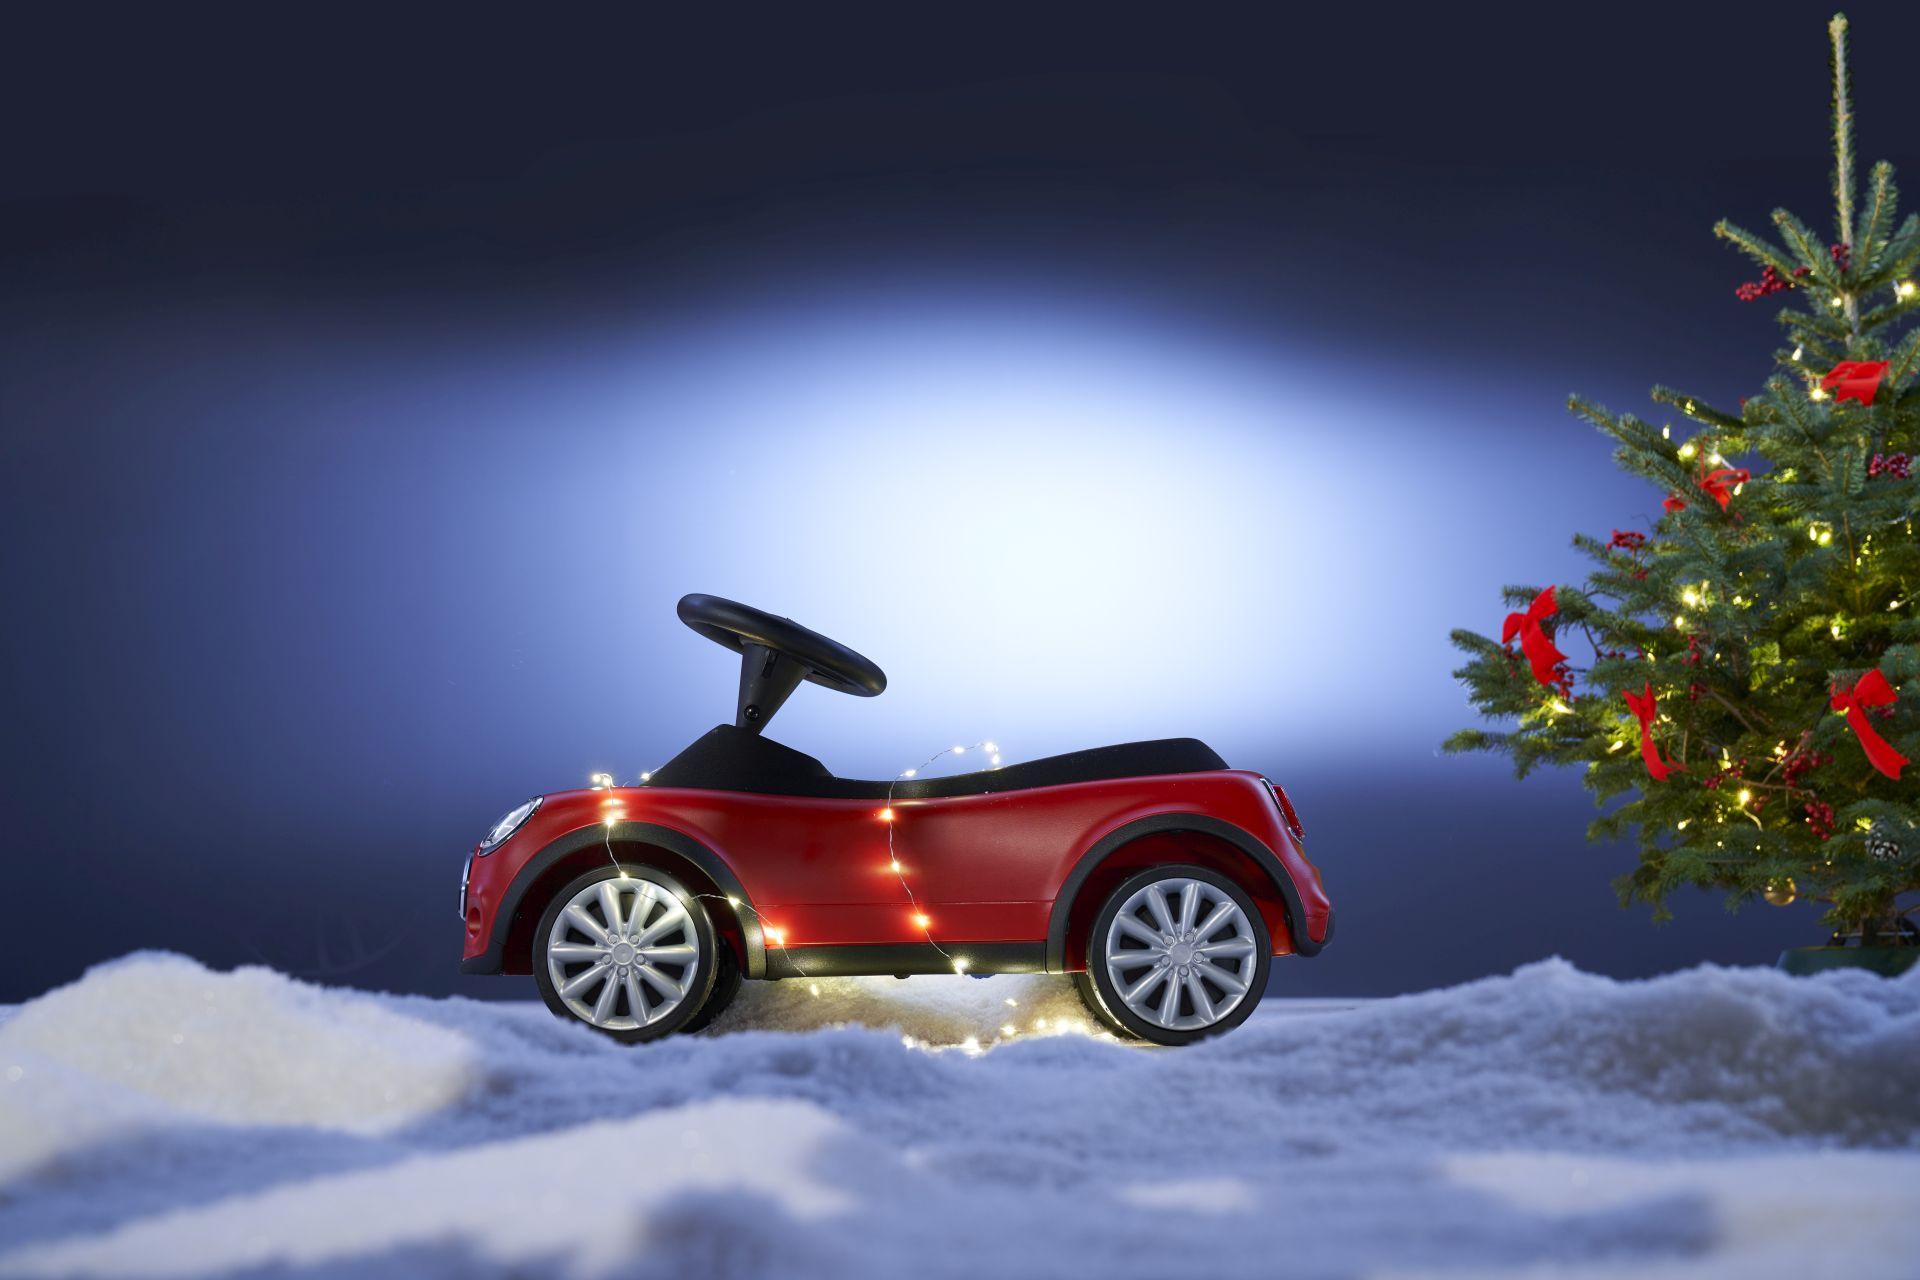 MINI Holiday Season gift 23